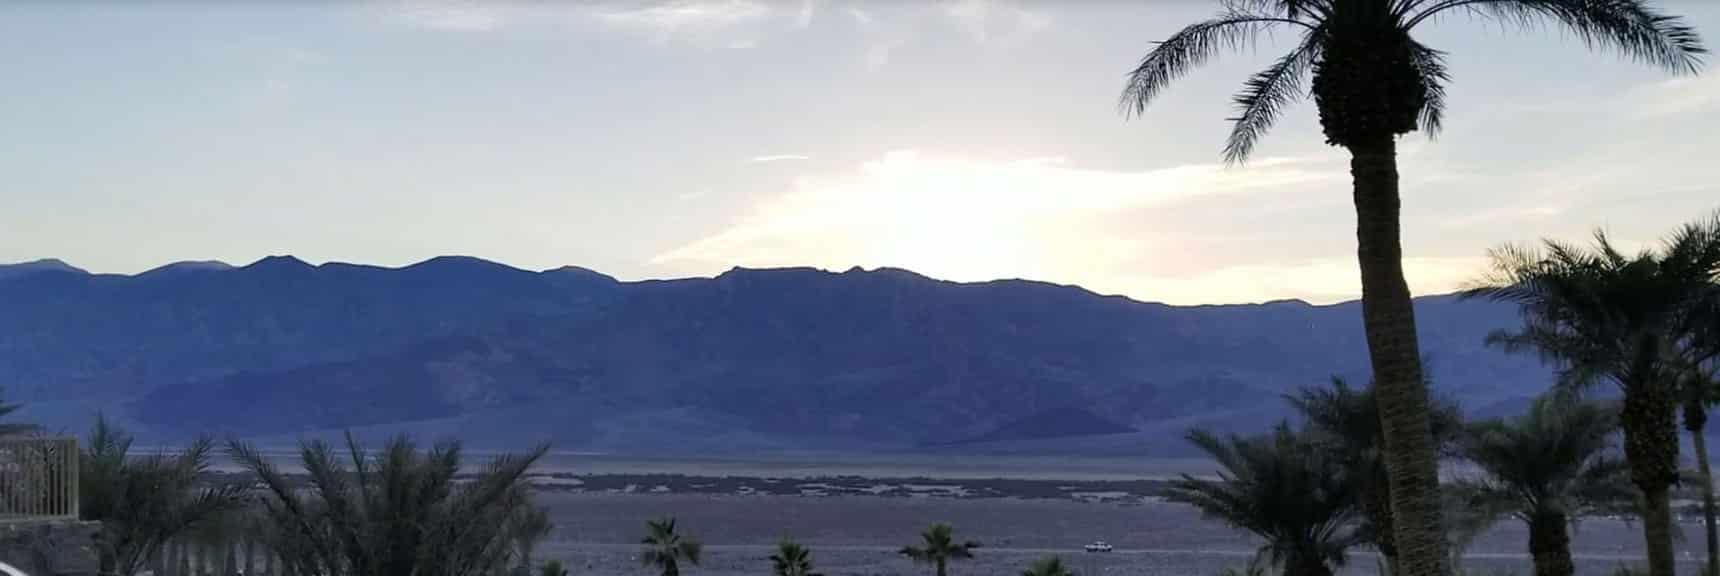 Sunset Over Death Valley National Park November 24th 2018